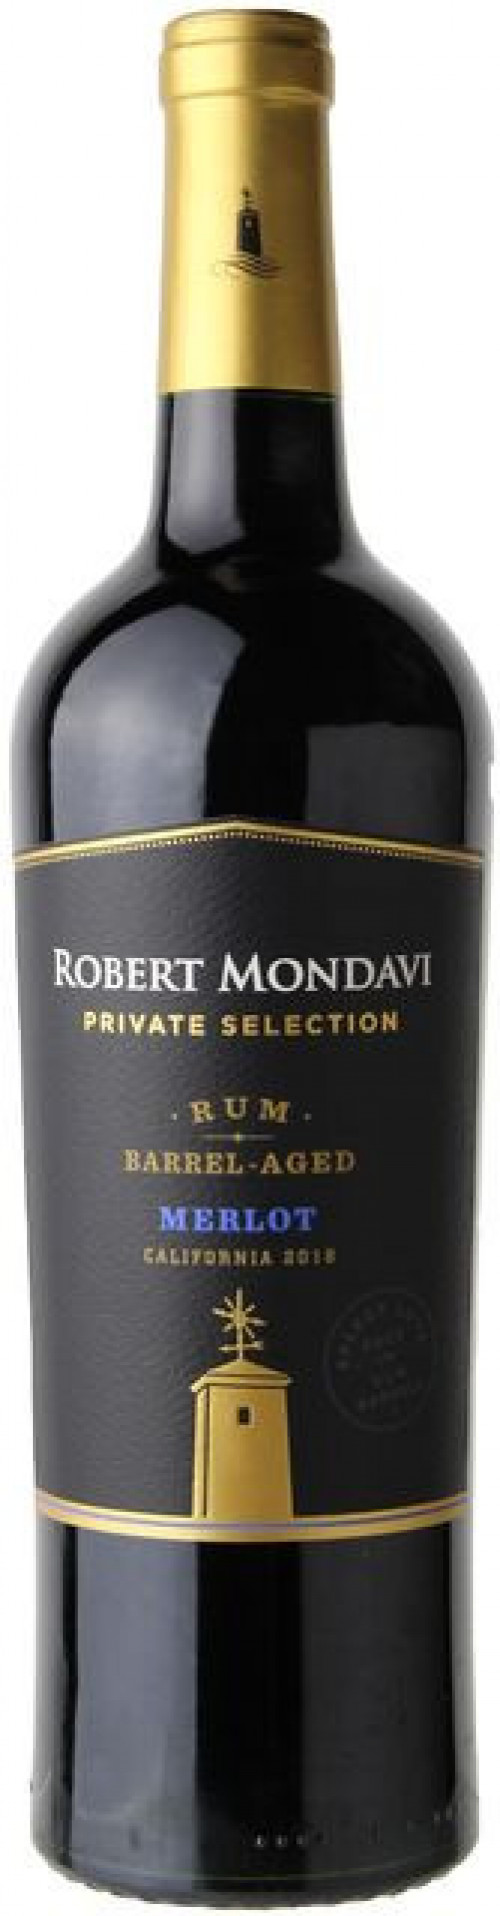 Robert Mondavi Private Selection Rum Barrel Merlot 750ml